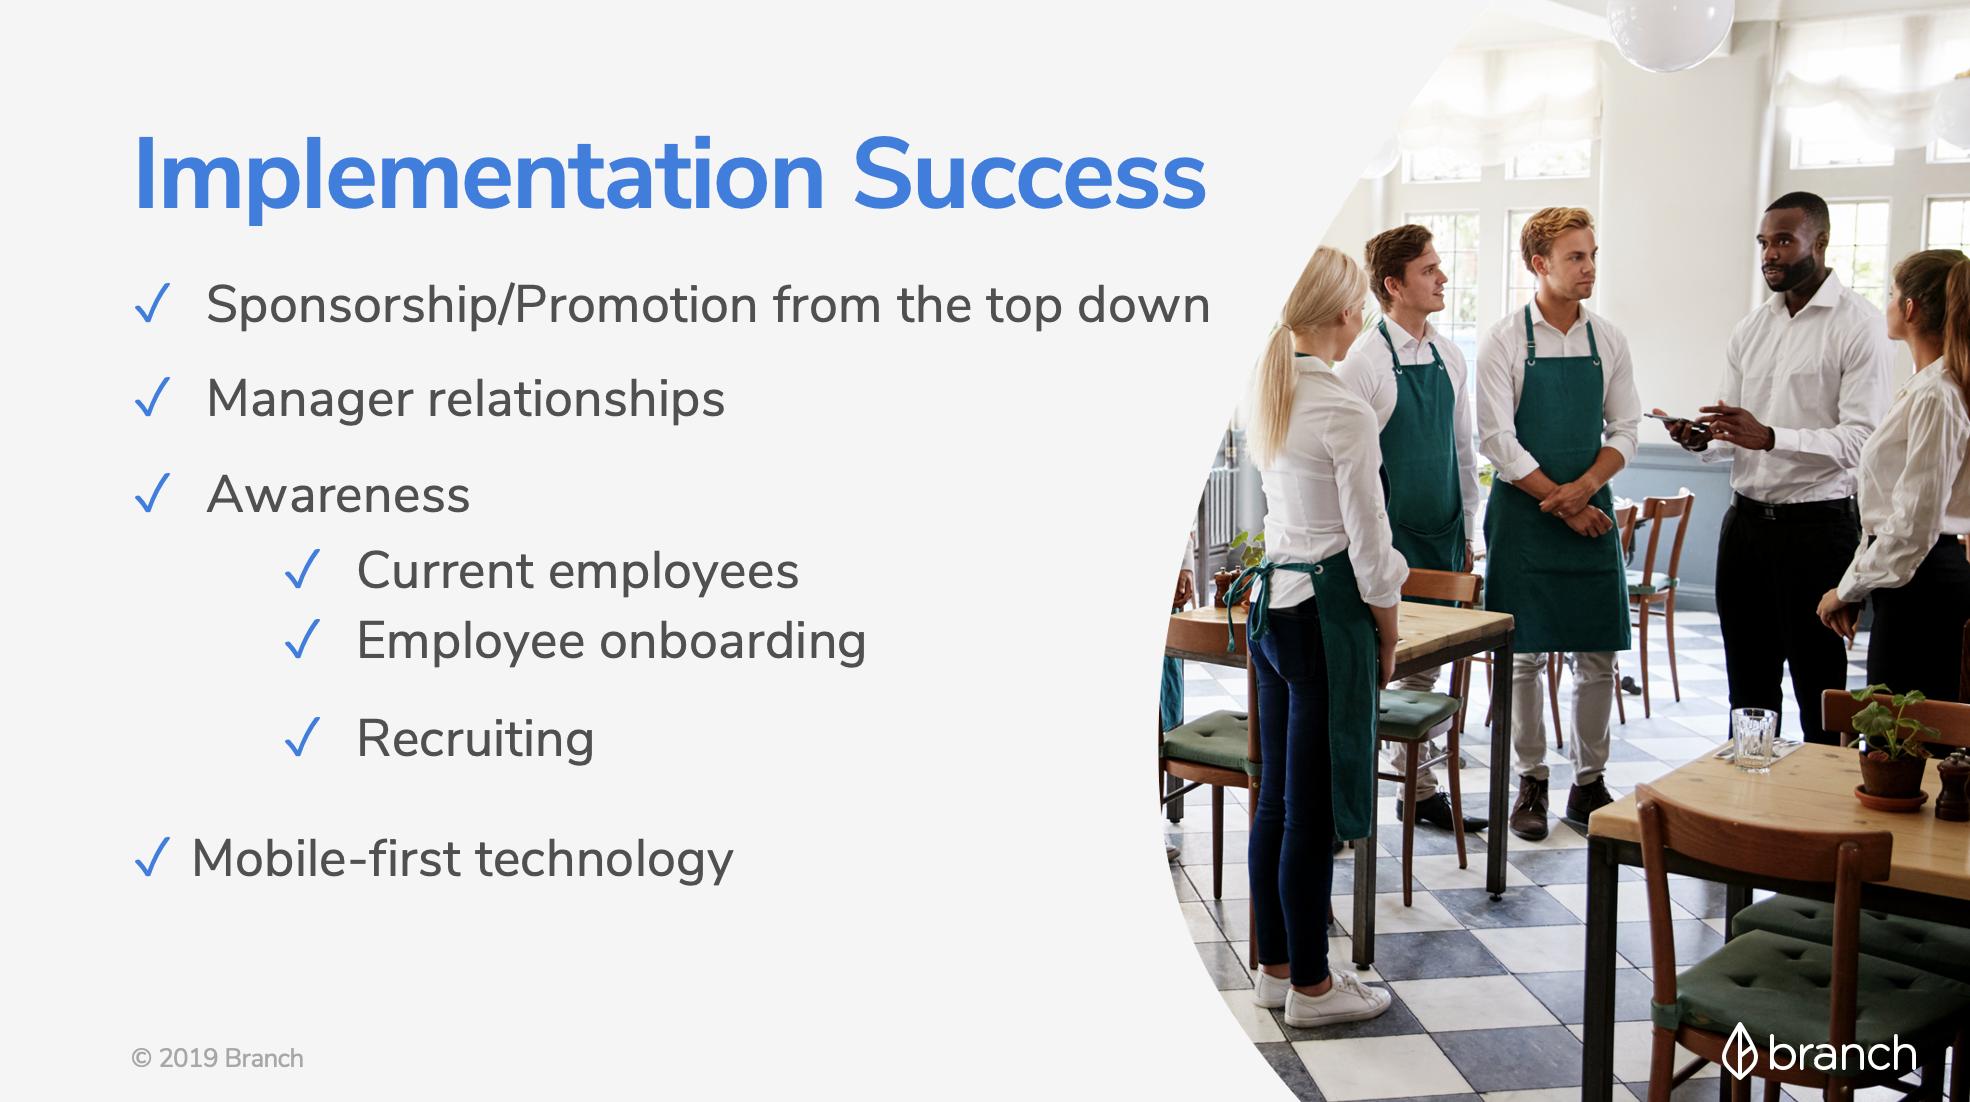 EWA Implementation Success Checklist